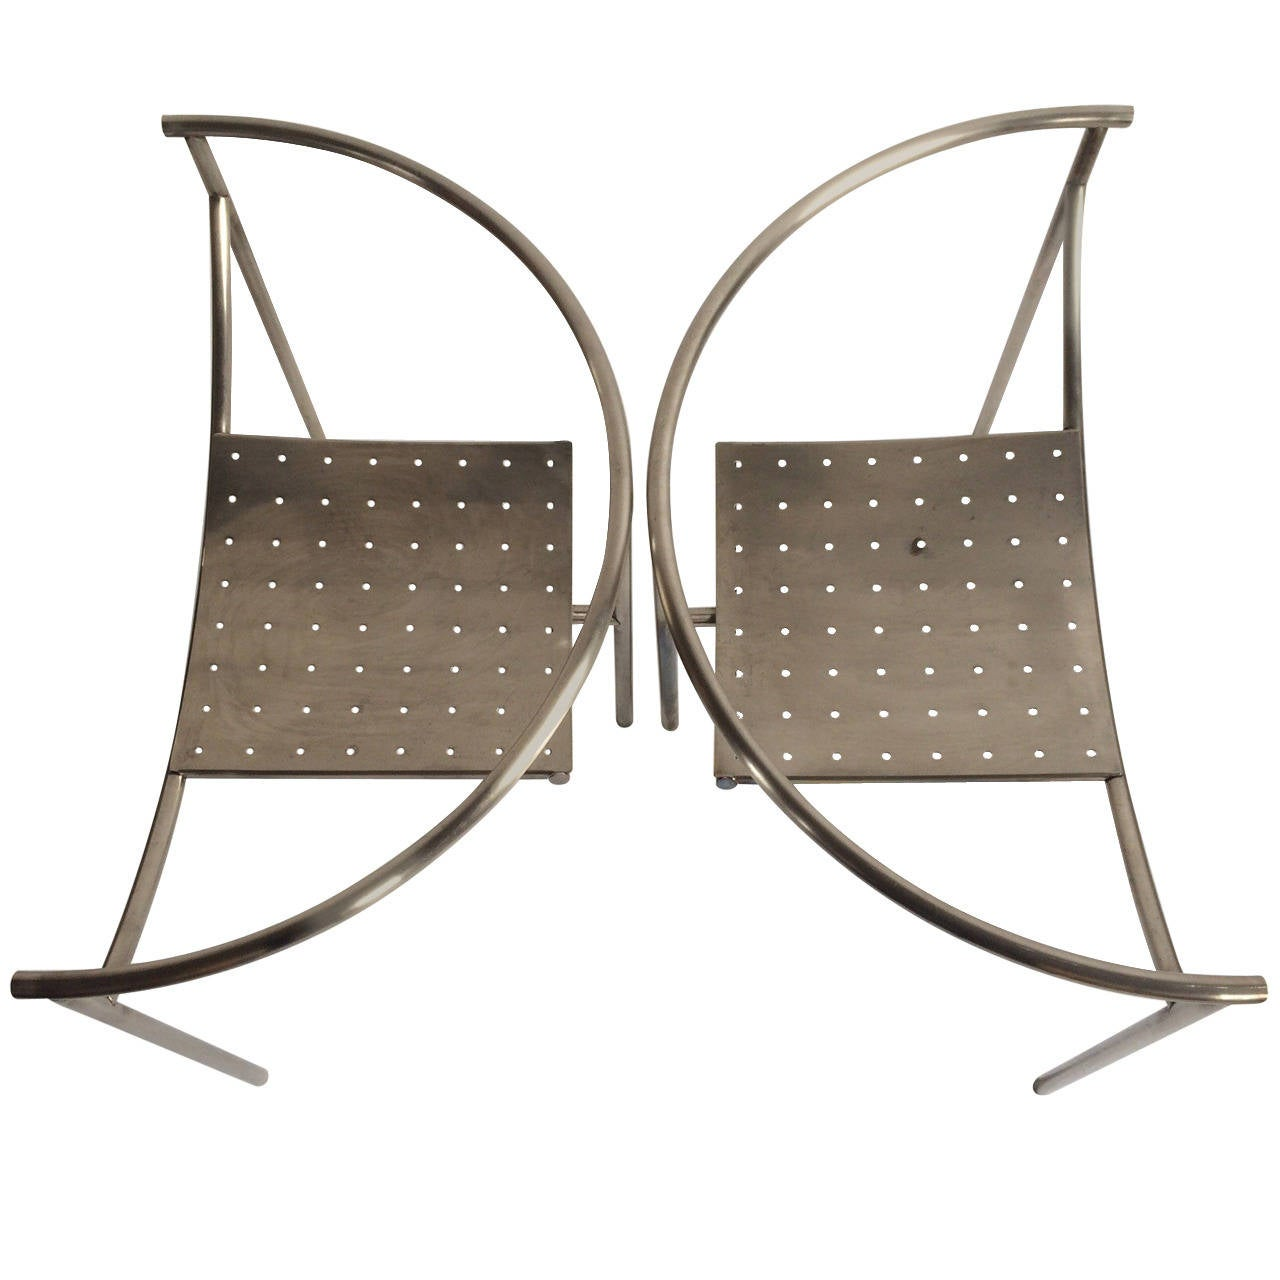 Dr sonderbar chairs philippe starck at 1stdibs - Chaises philippe starck ...